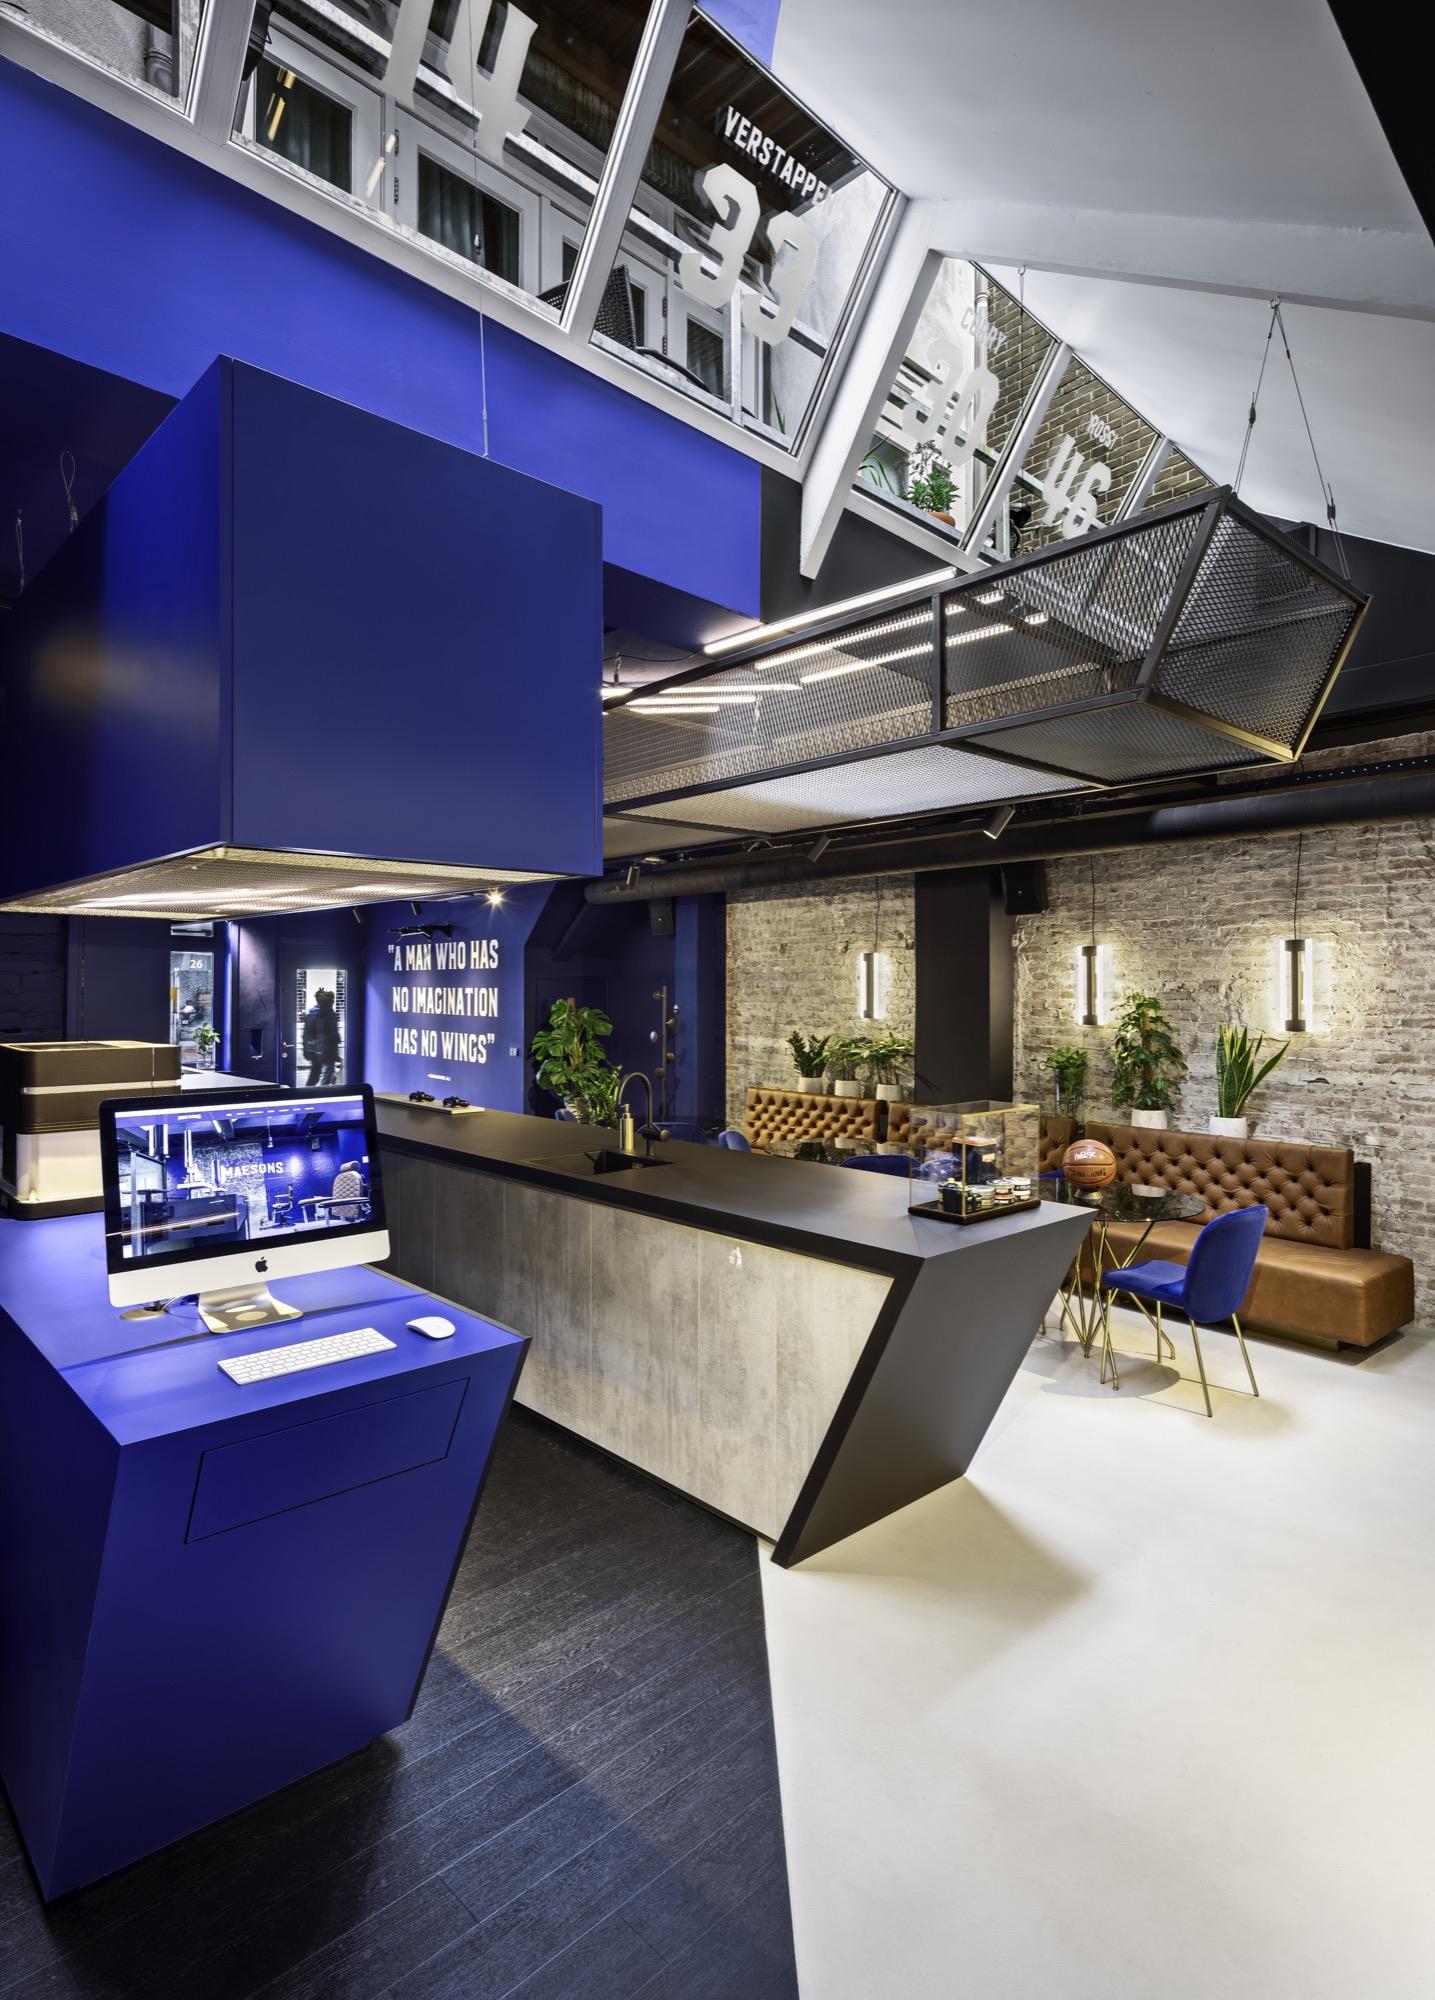 <p>Bar &#8211; Desk &#8211; Photo: J. Rodycz</p>